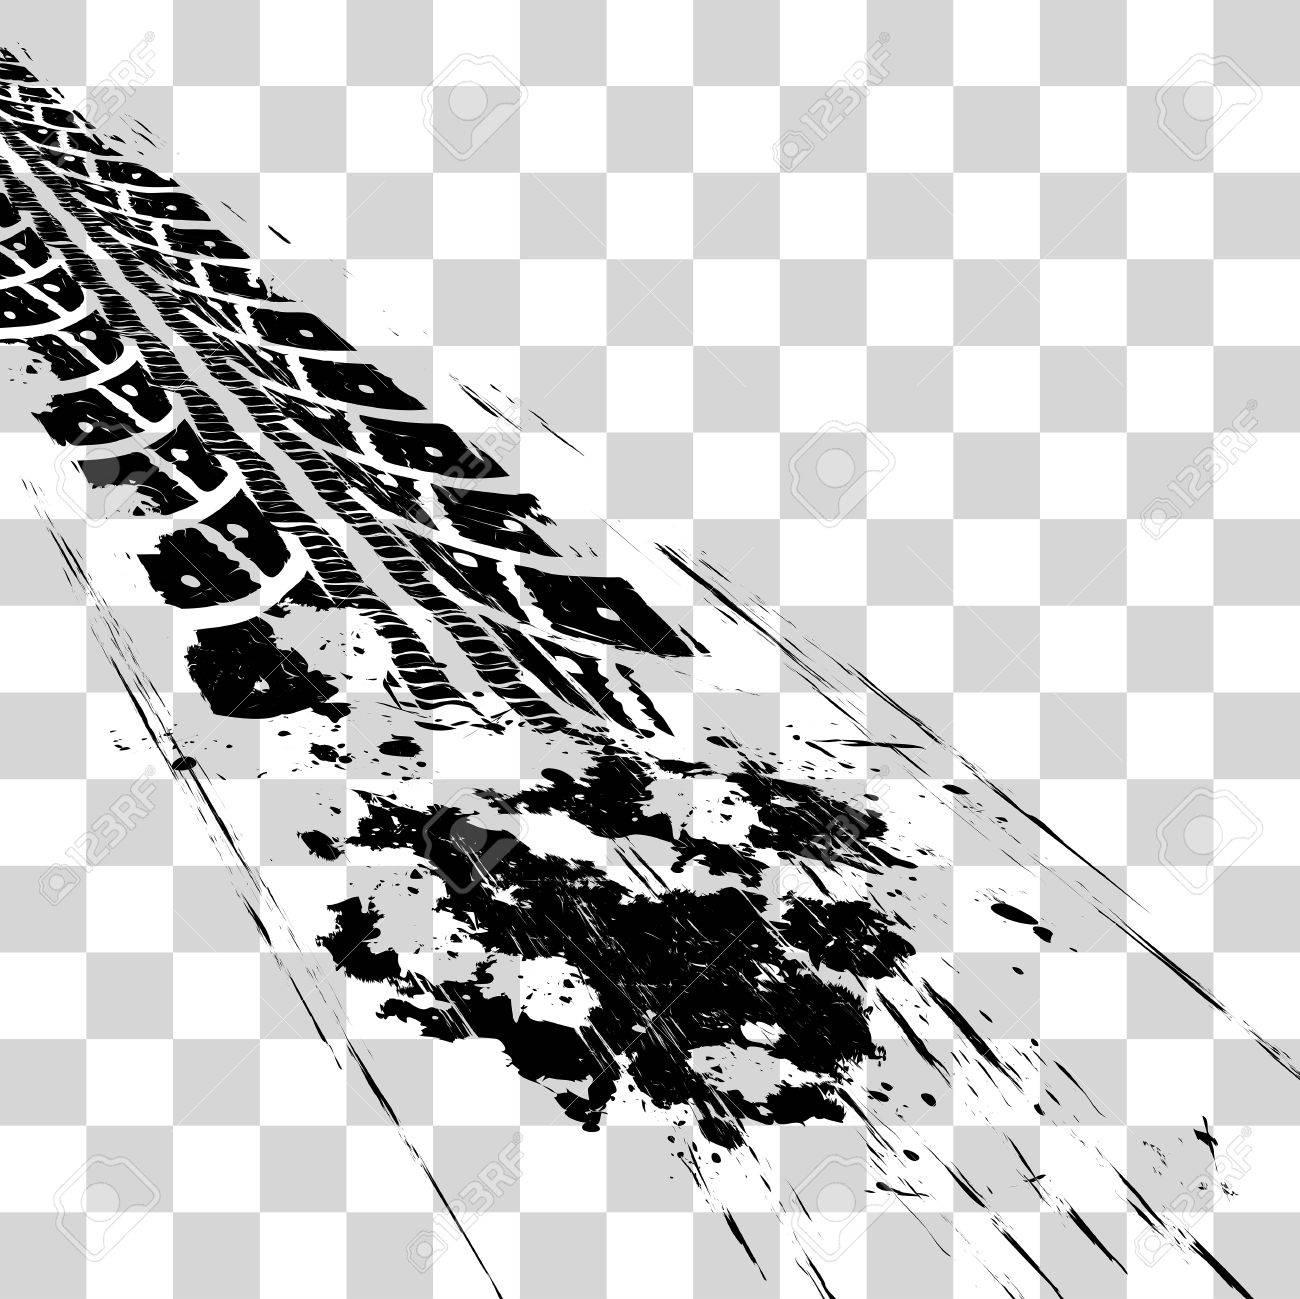 Tire tracks. Vector illustration onon checkered background - 51741330